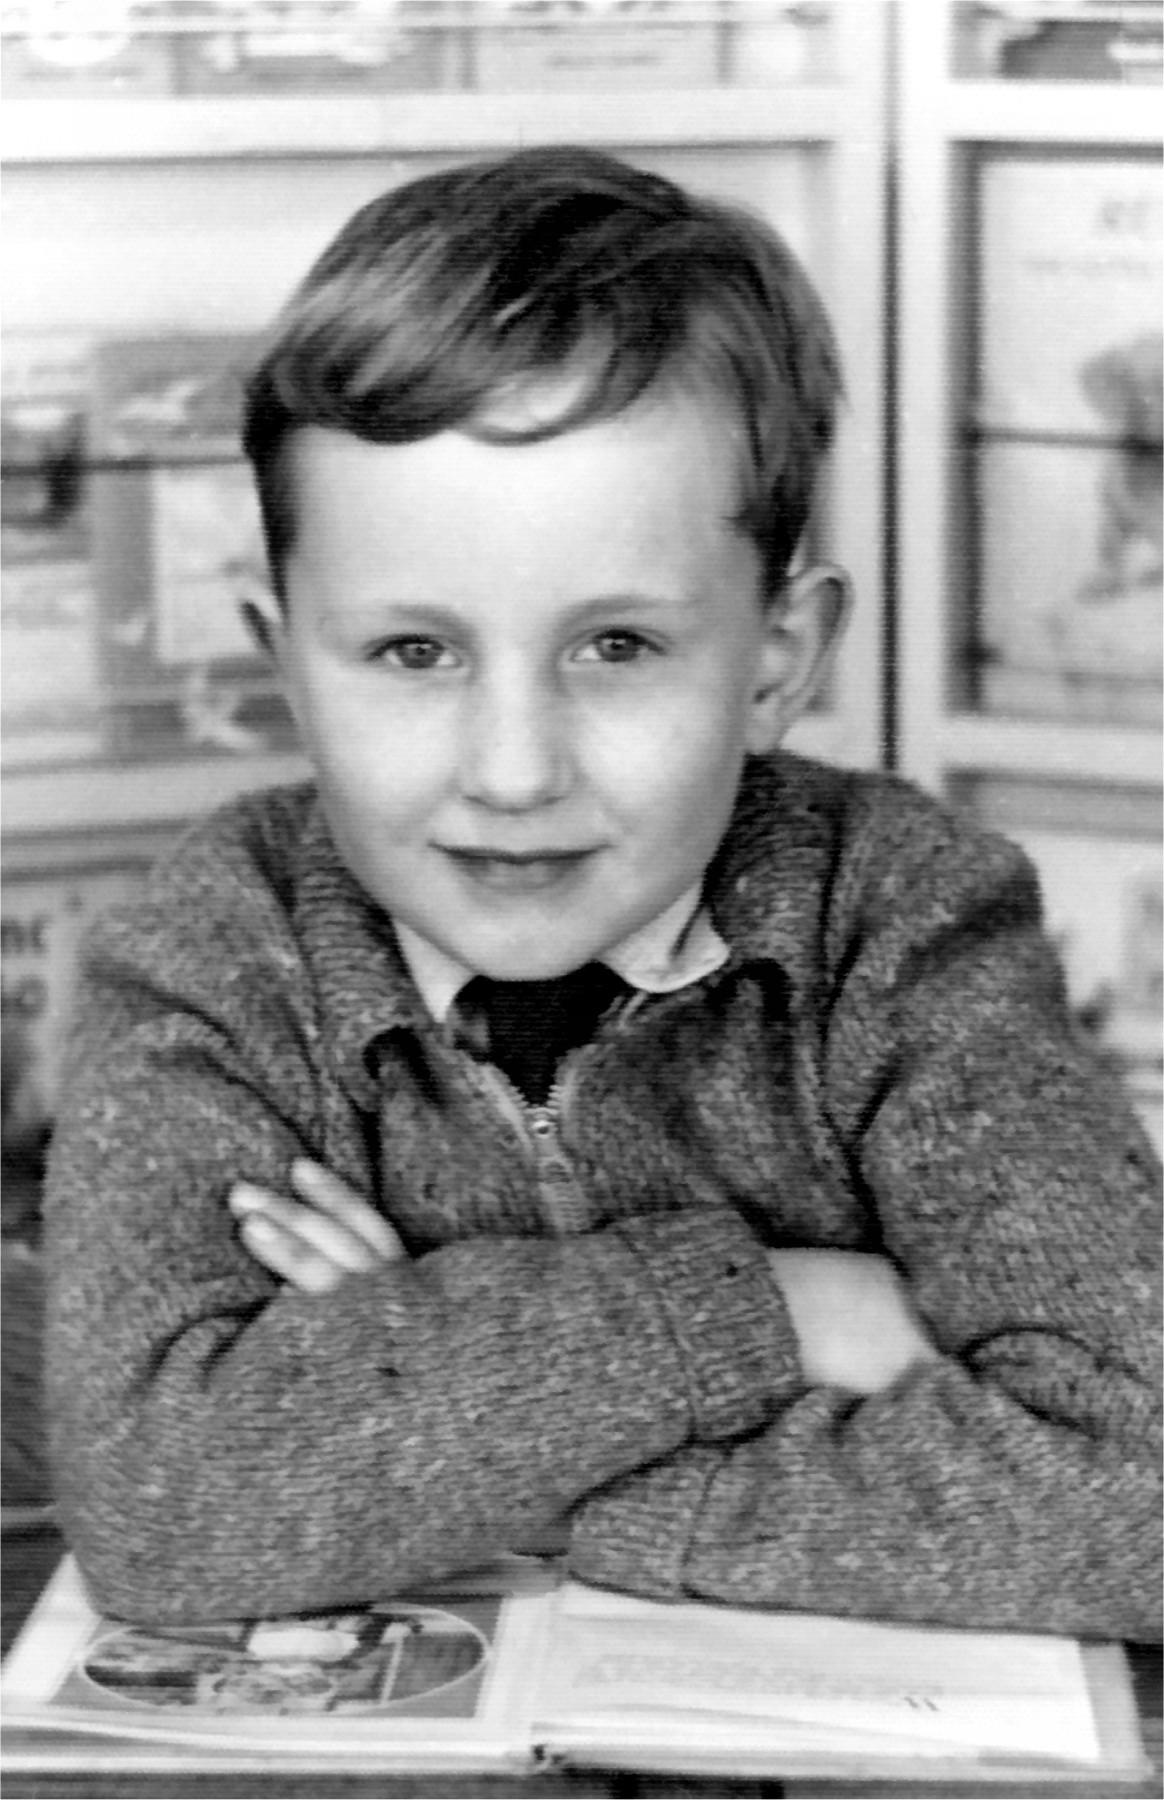 Roy Manterfield (1959)